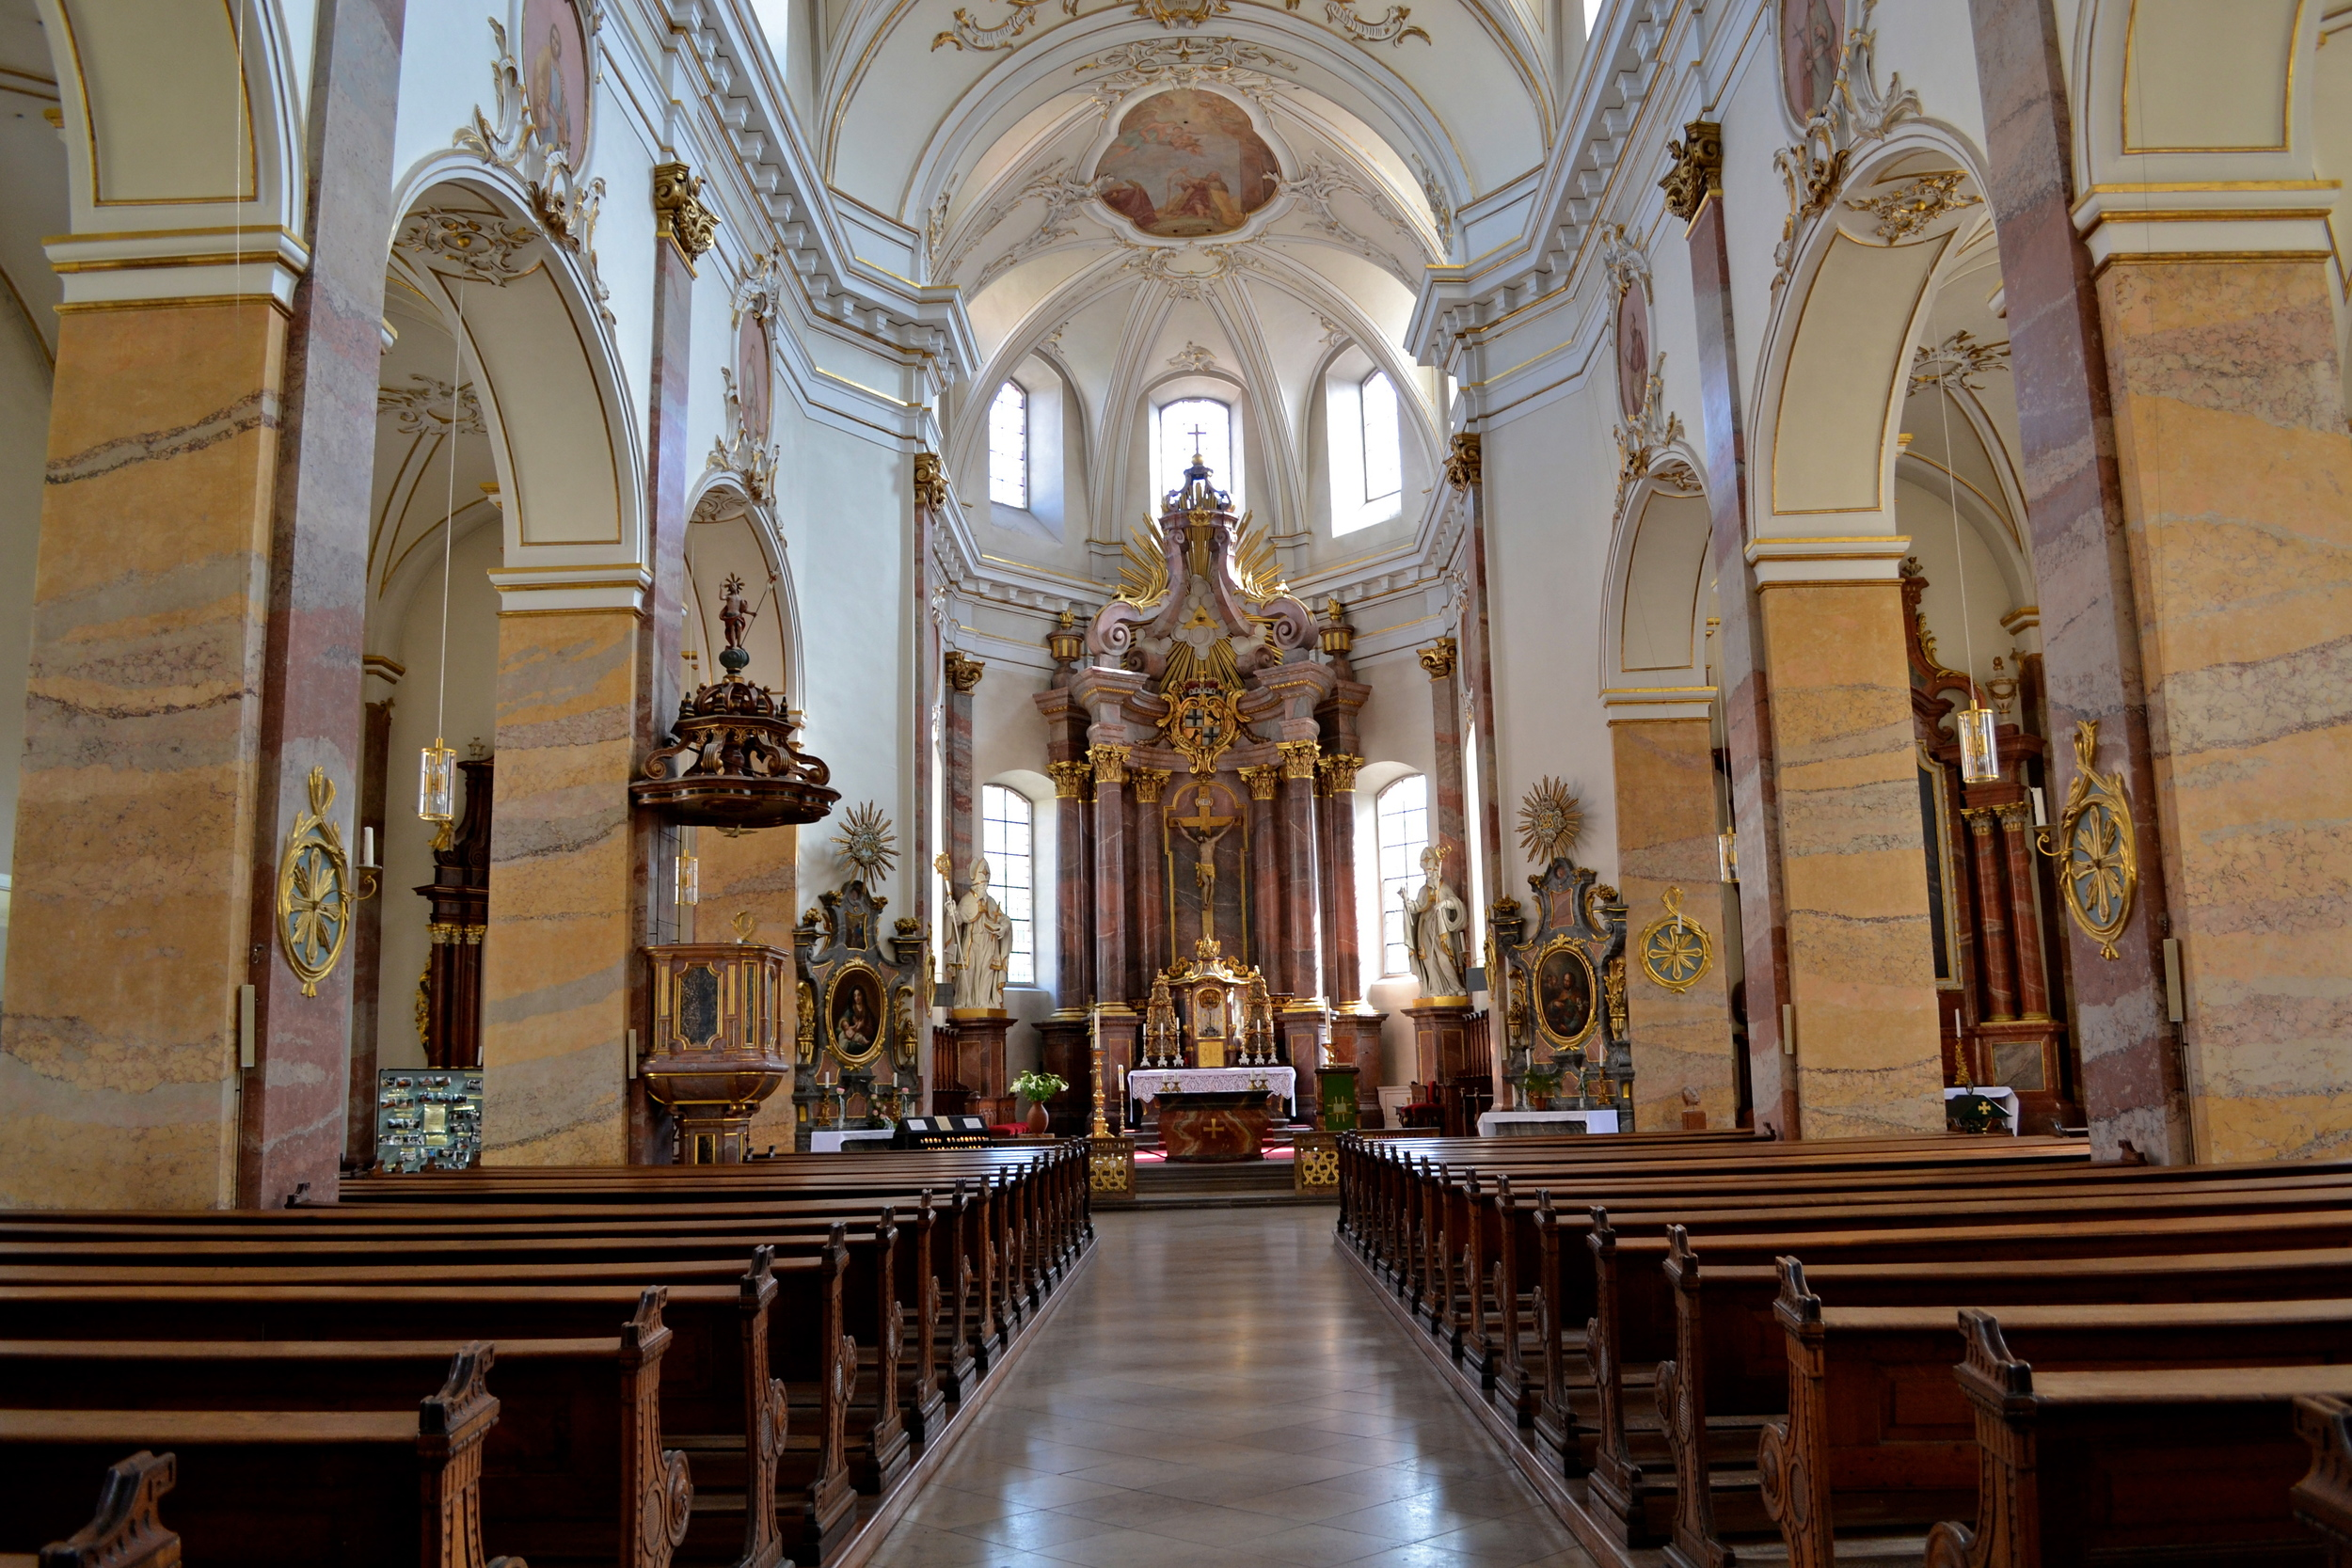 Interior of the Stadtpfarrkirche, an 18th-century Baroque style church.